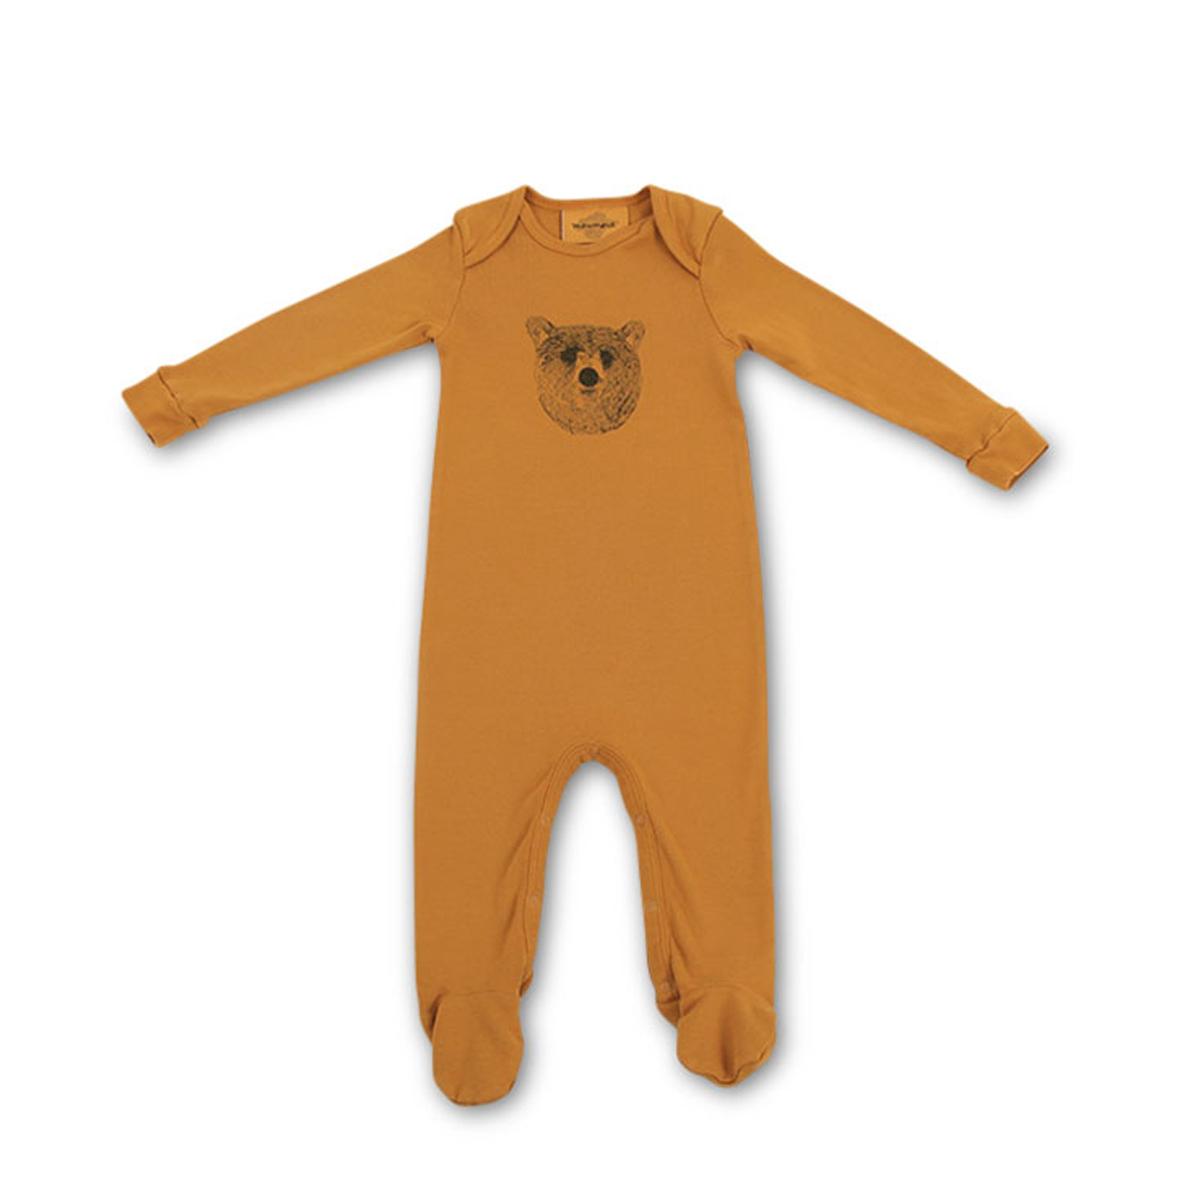 0d90620c57ab1 Body   Pyjama Pyjama Bobo - Baloo   Moutarde - 3 Mois Pyjama Bobo - Baloo